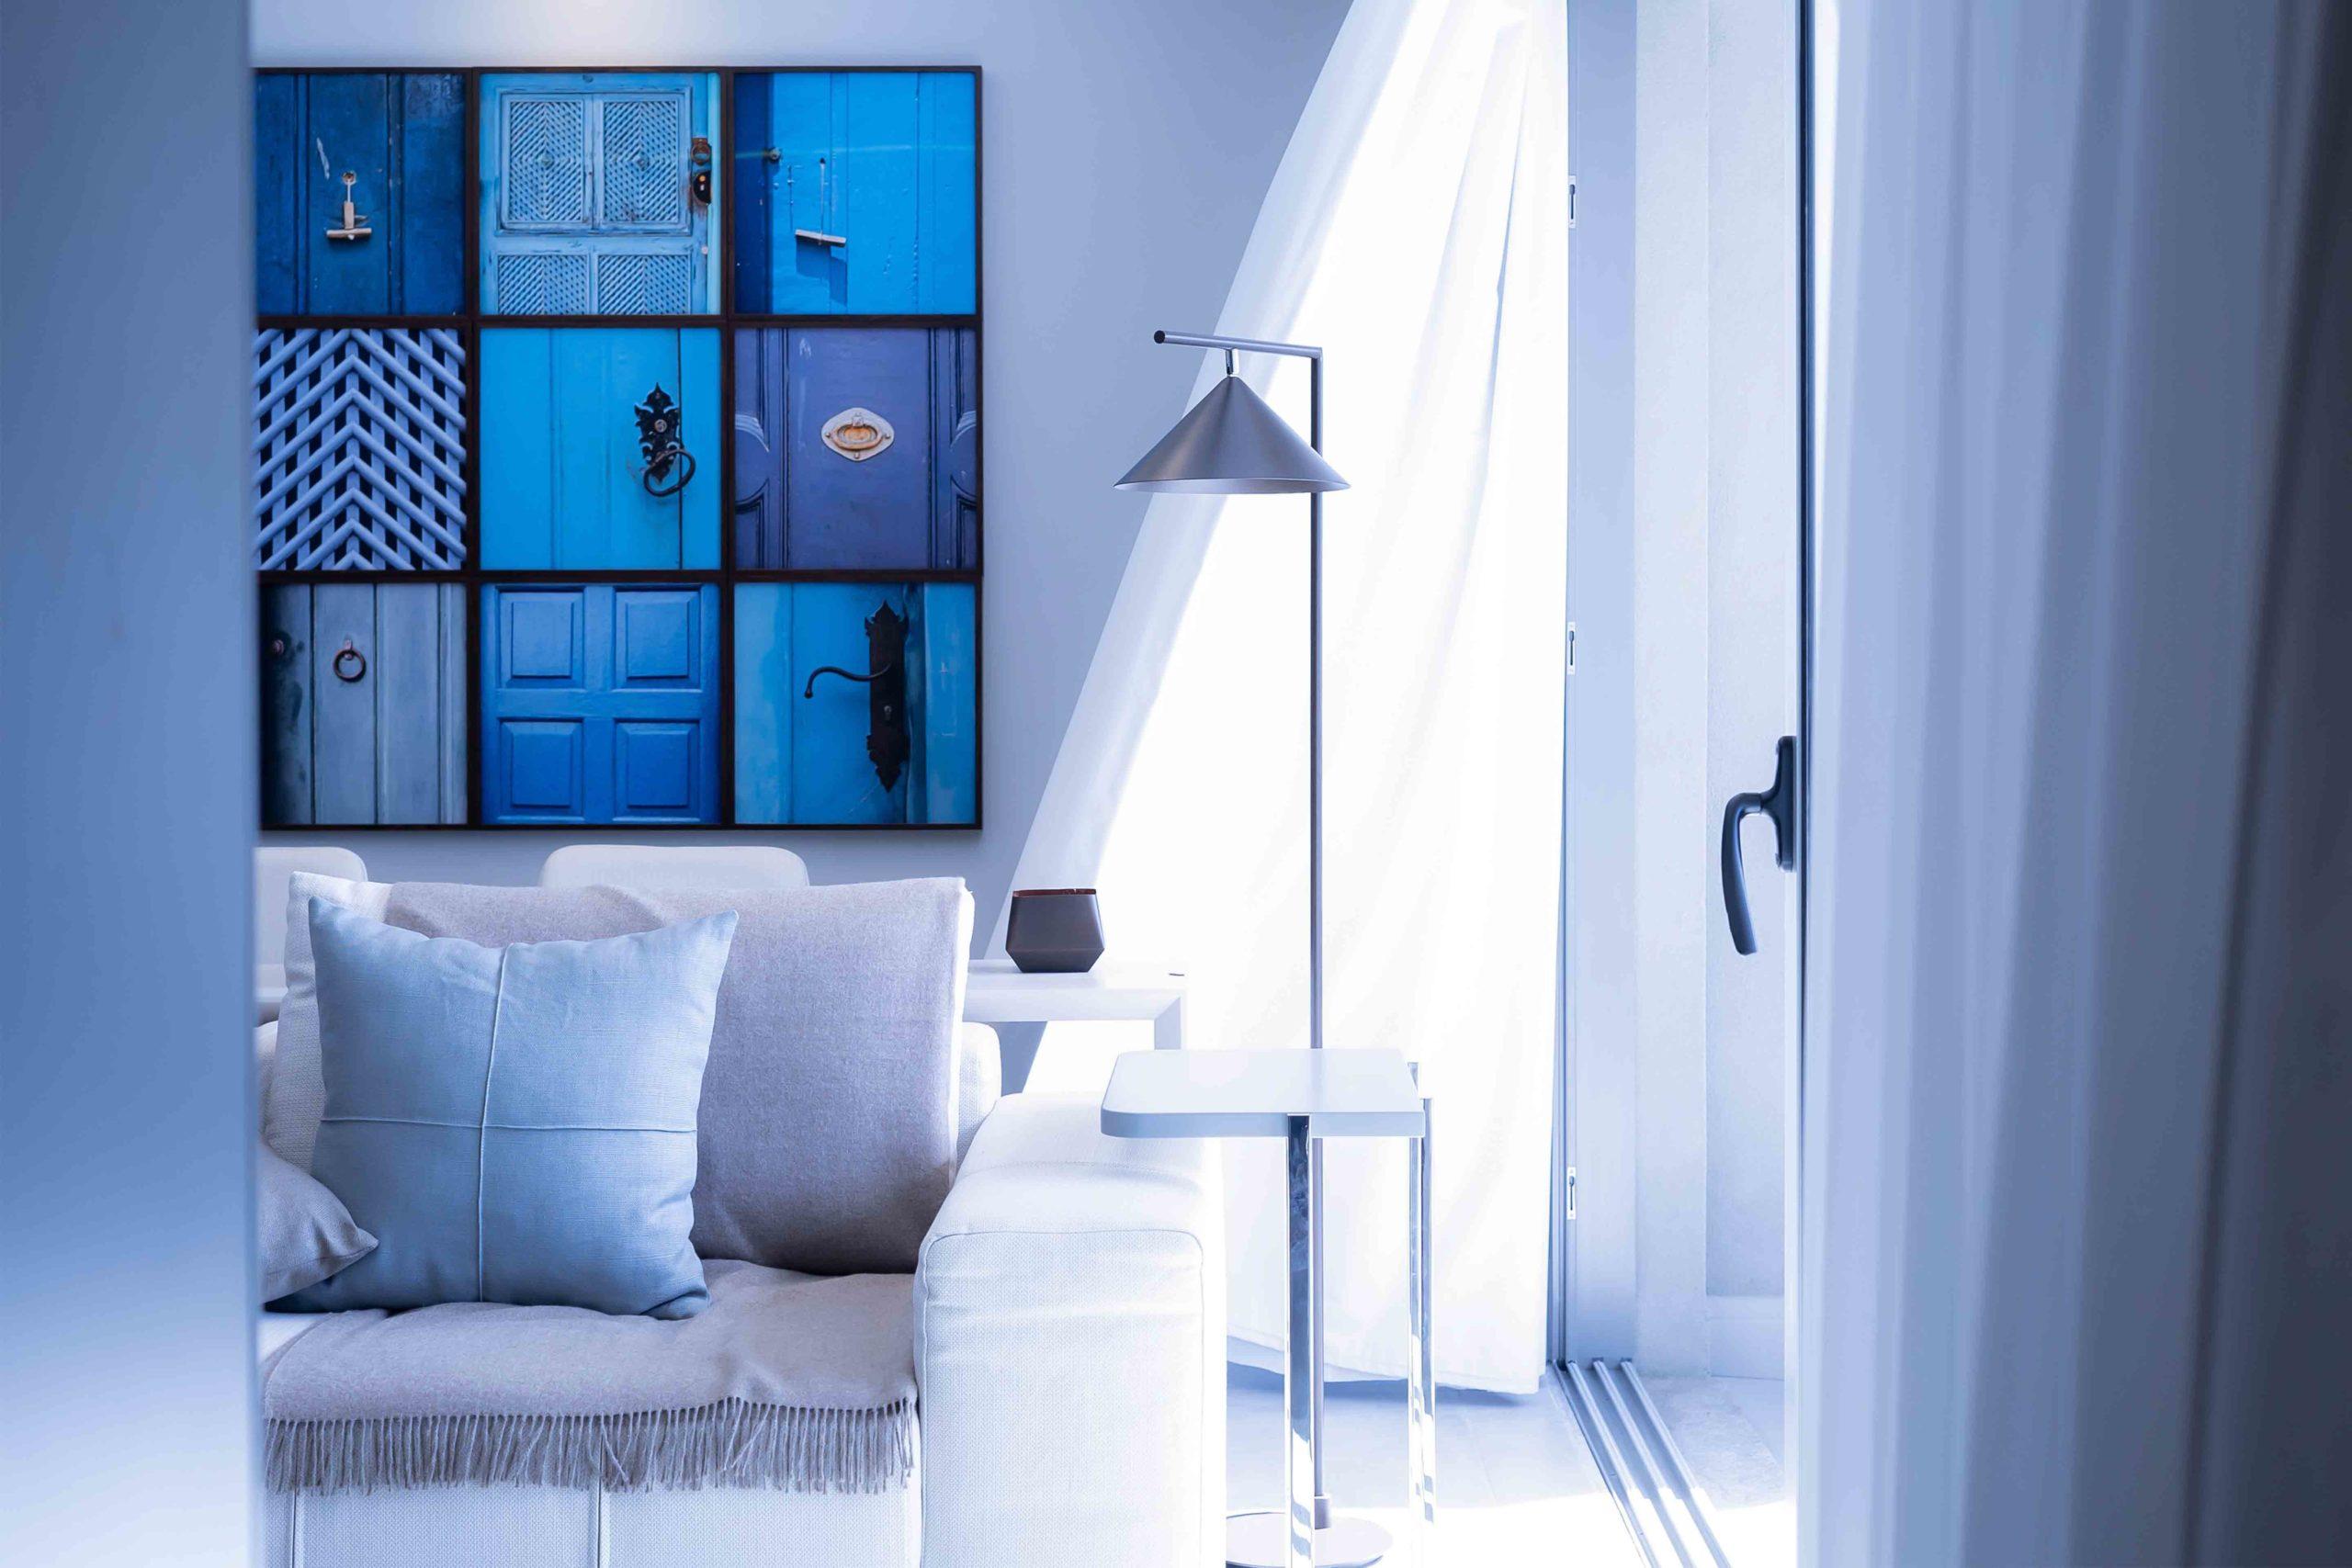 Condominium/Professional House Cleaning Services